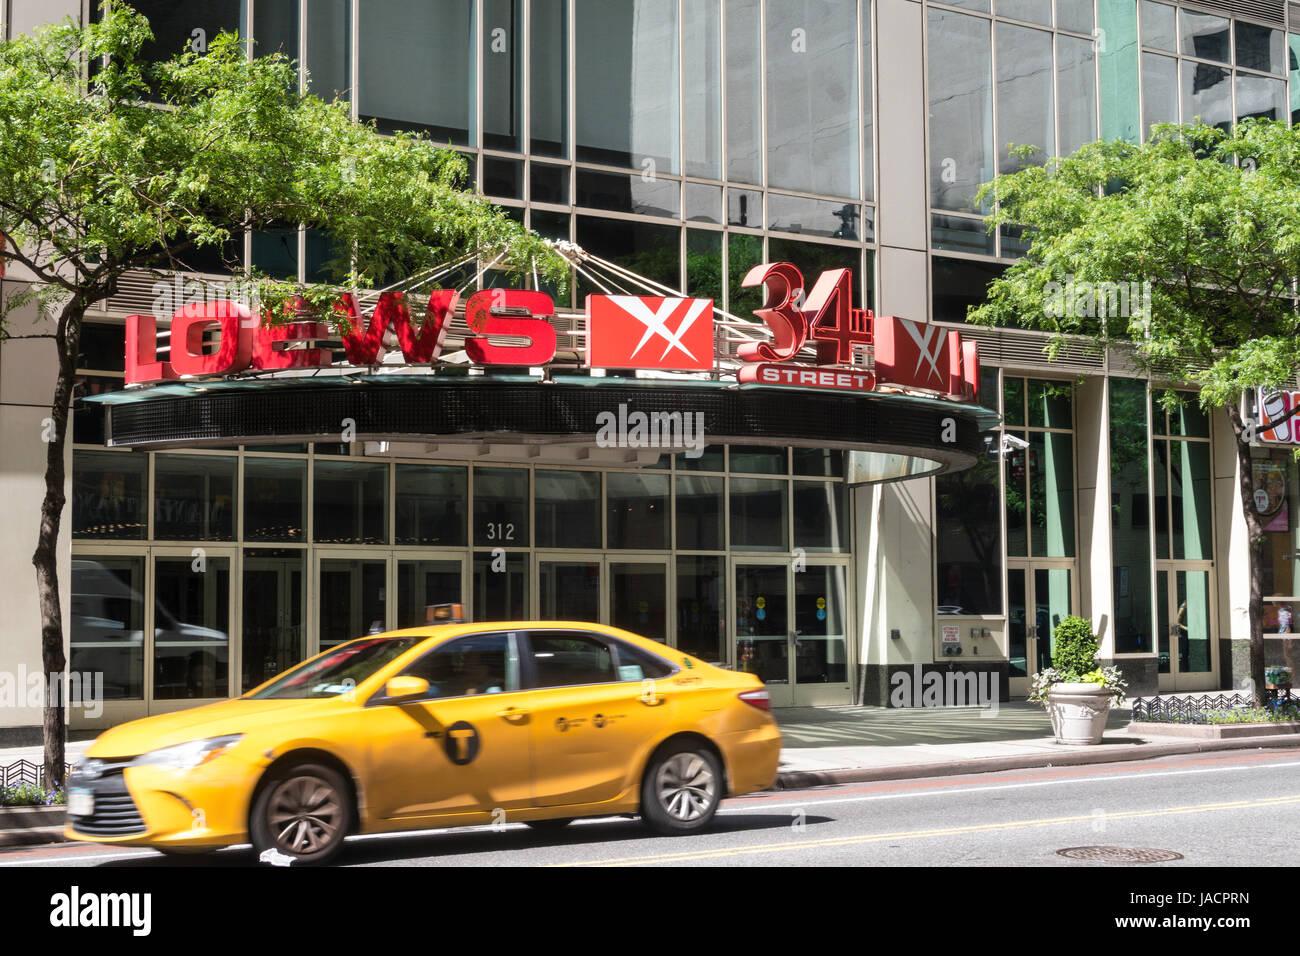 Loews Movie Theater on West 34th Street, NYC, USA - Stock Image